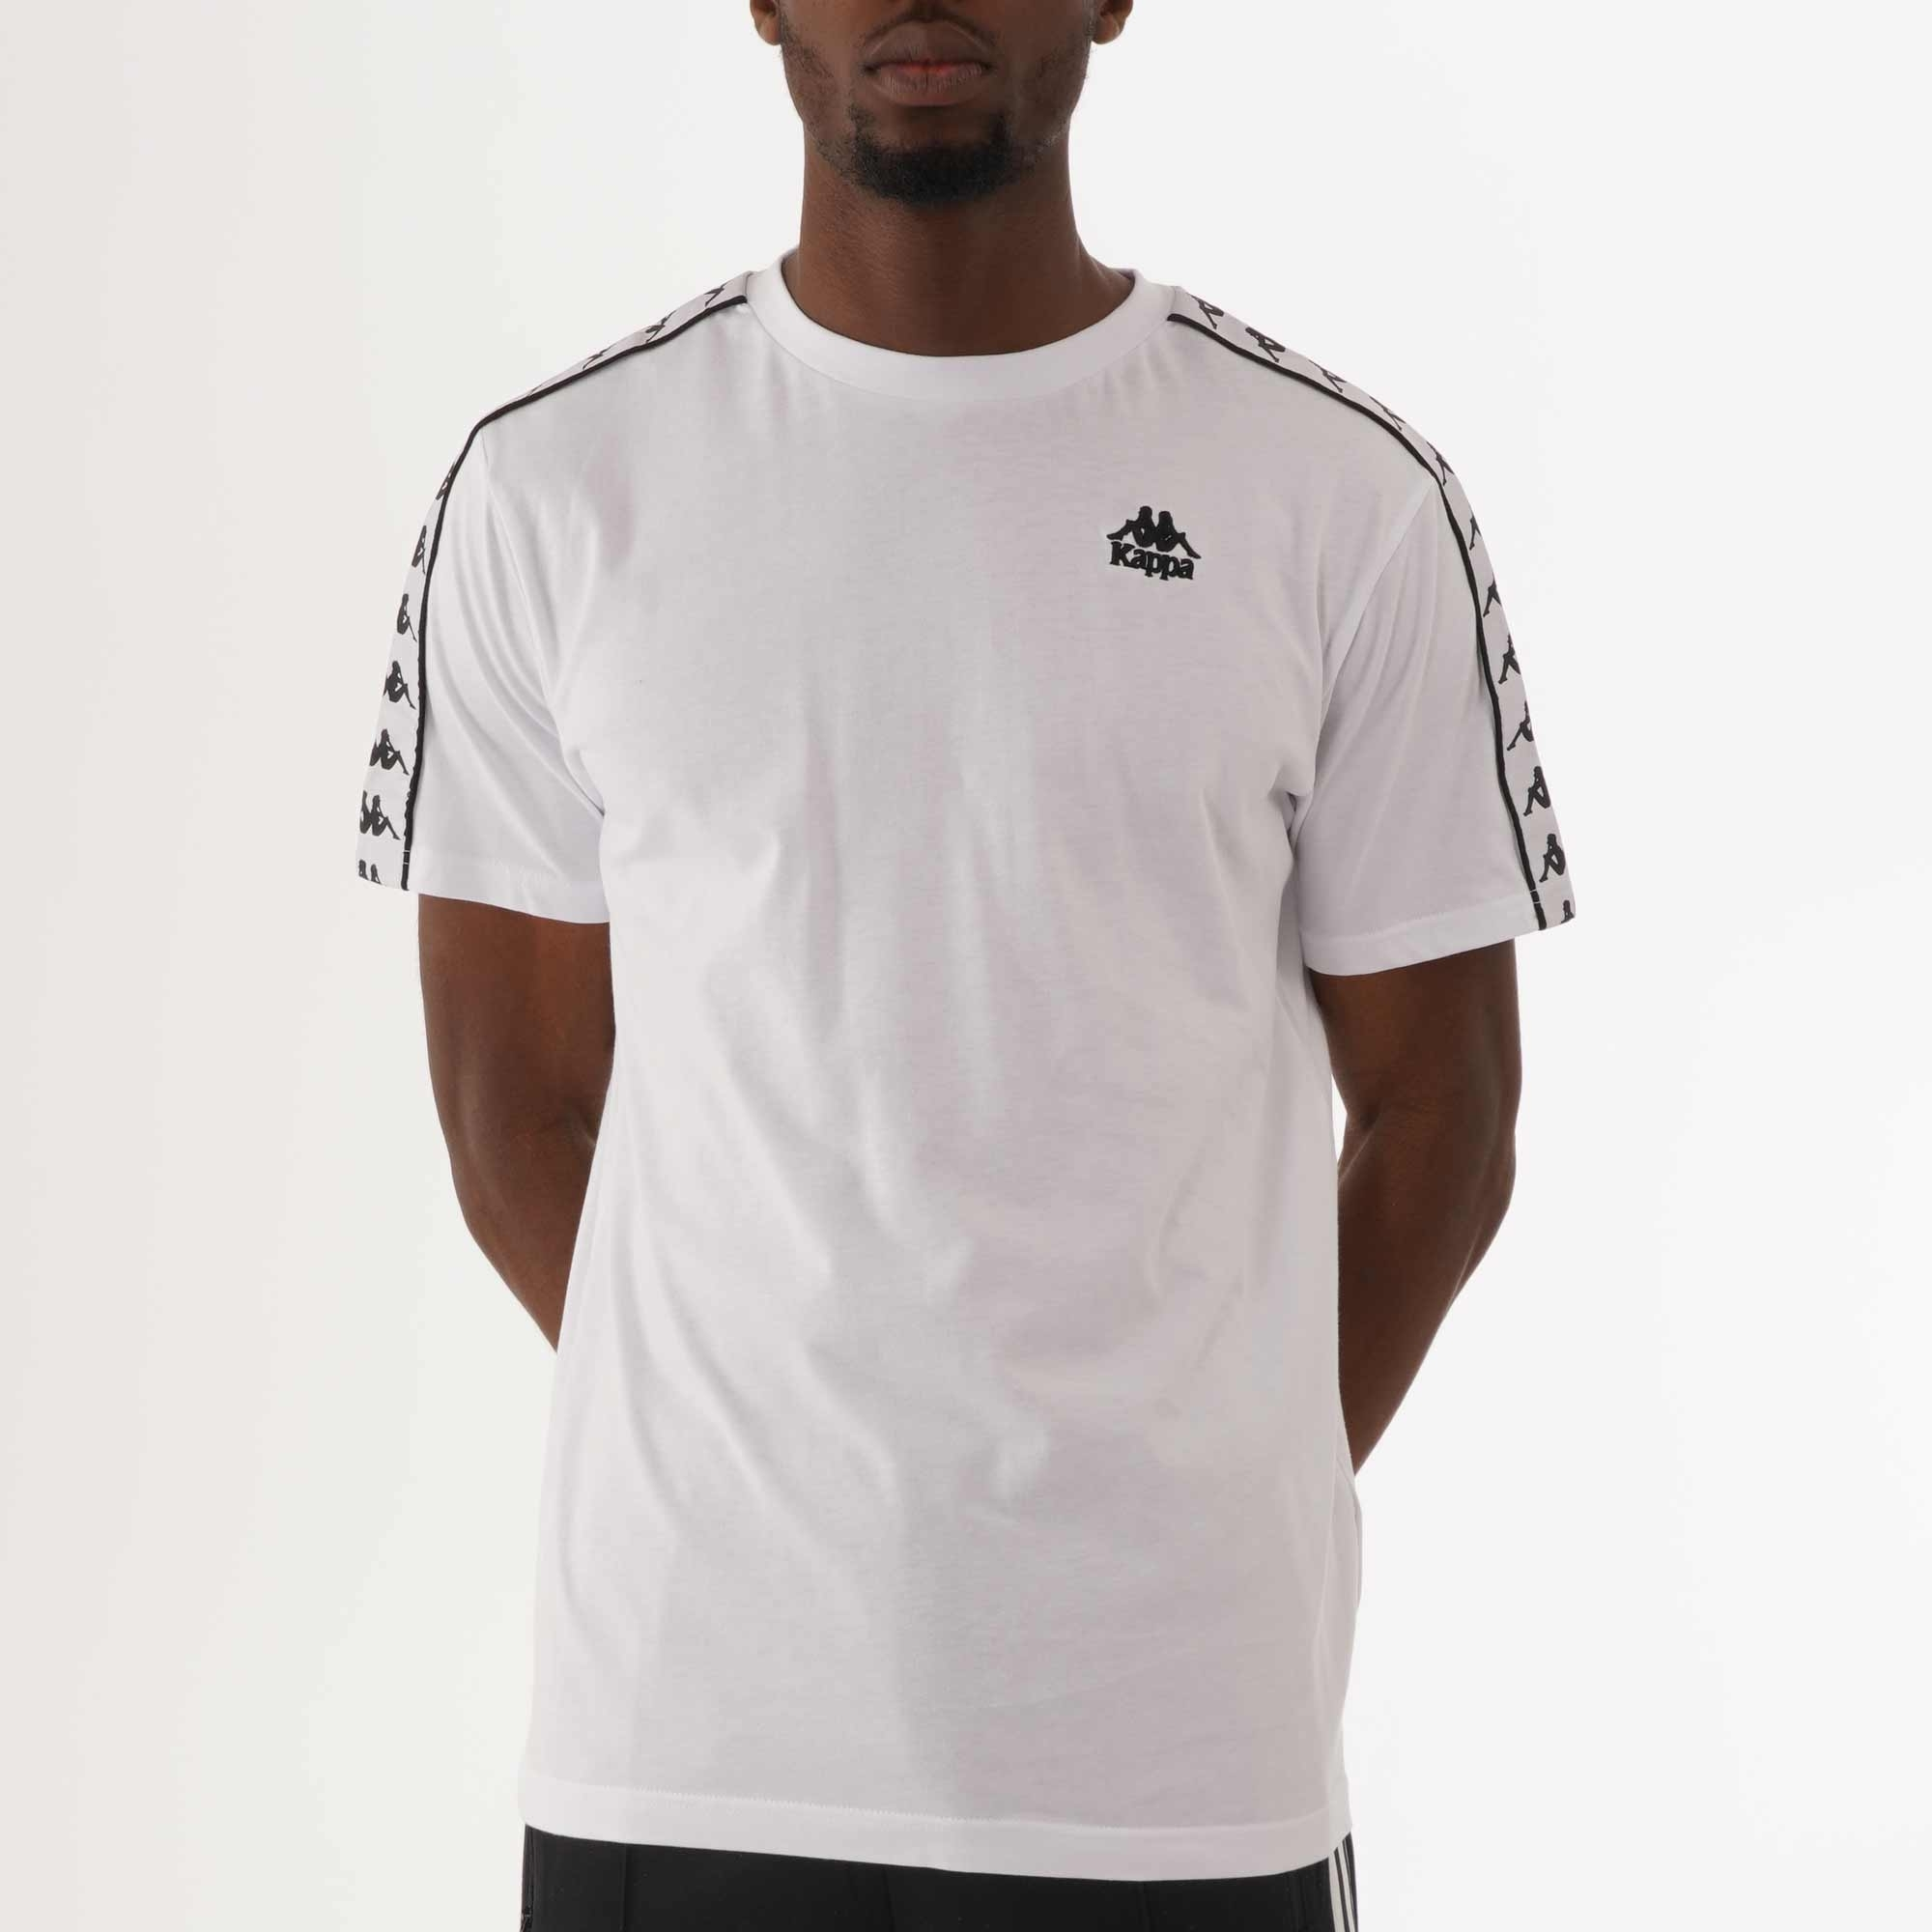 Pequeño Permitirse Vueltas y vueltas  Kappa 222 Banda Charlton T-Shirt | White | 304KPR0